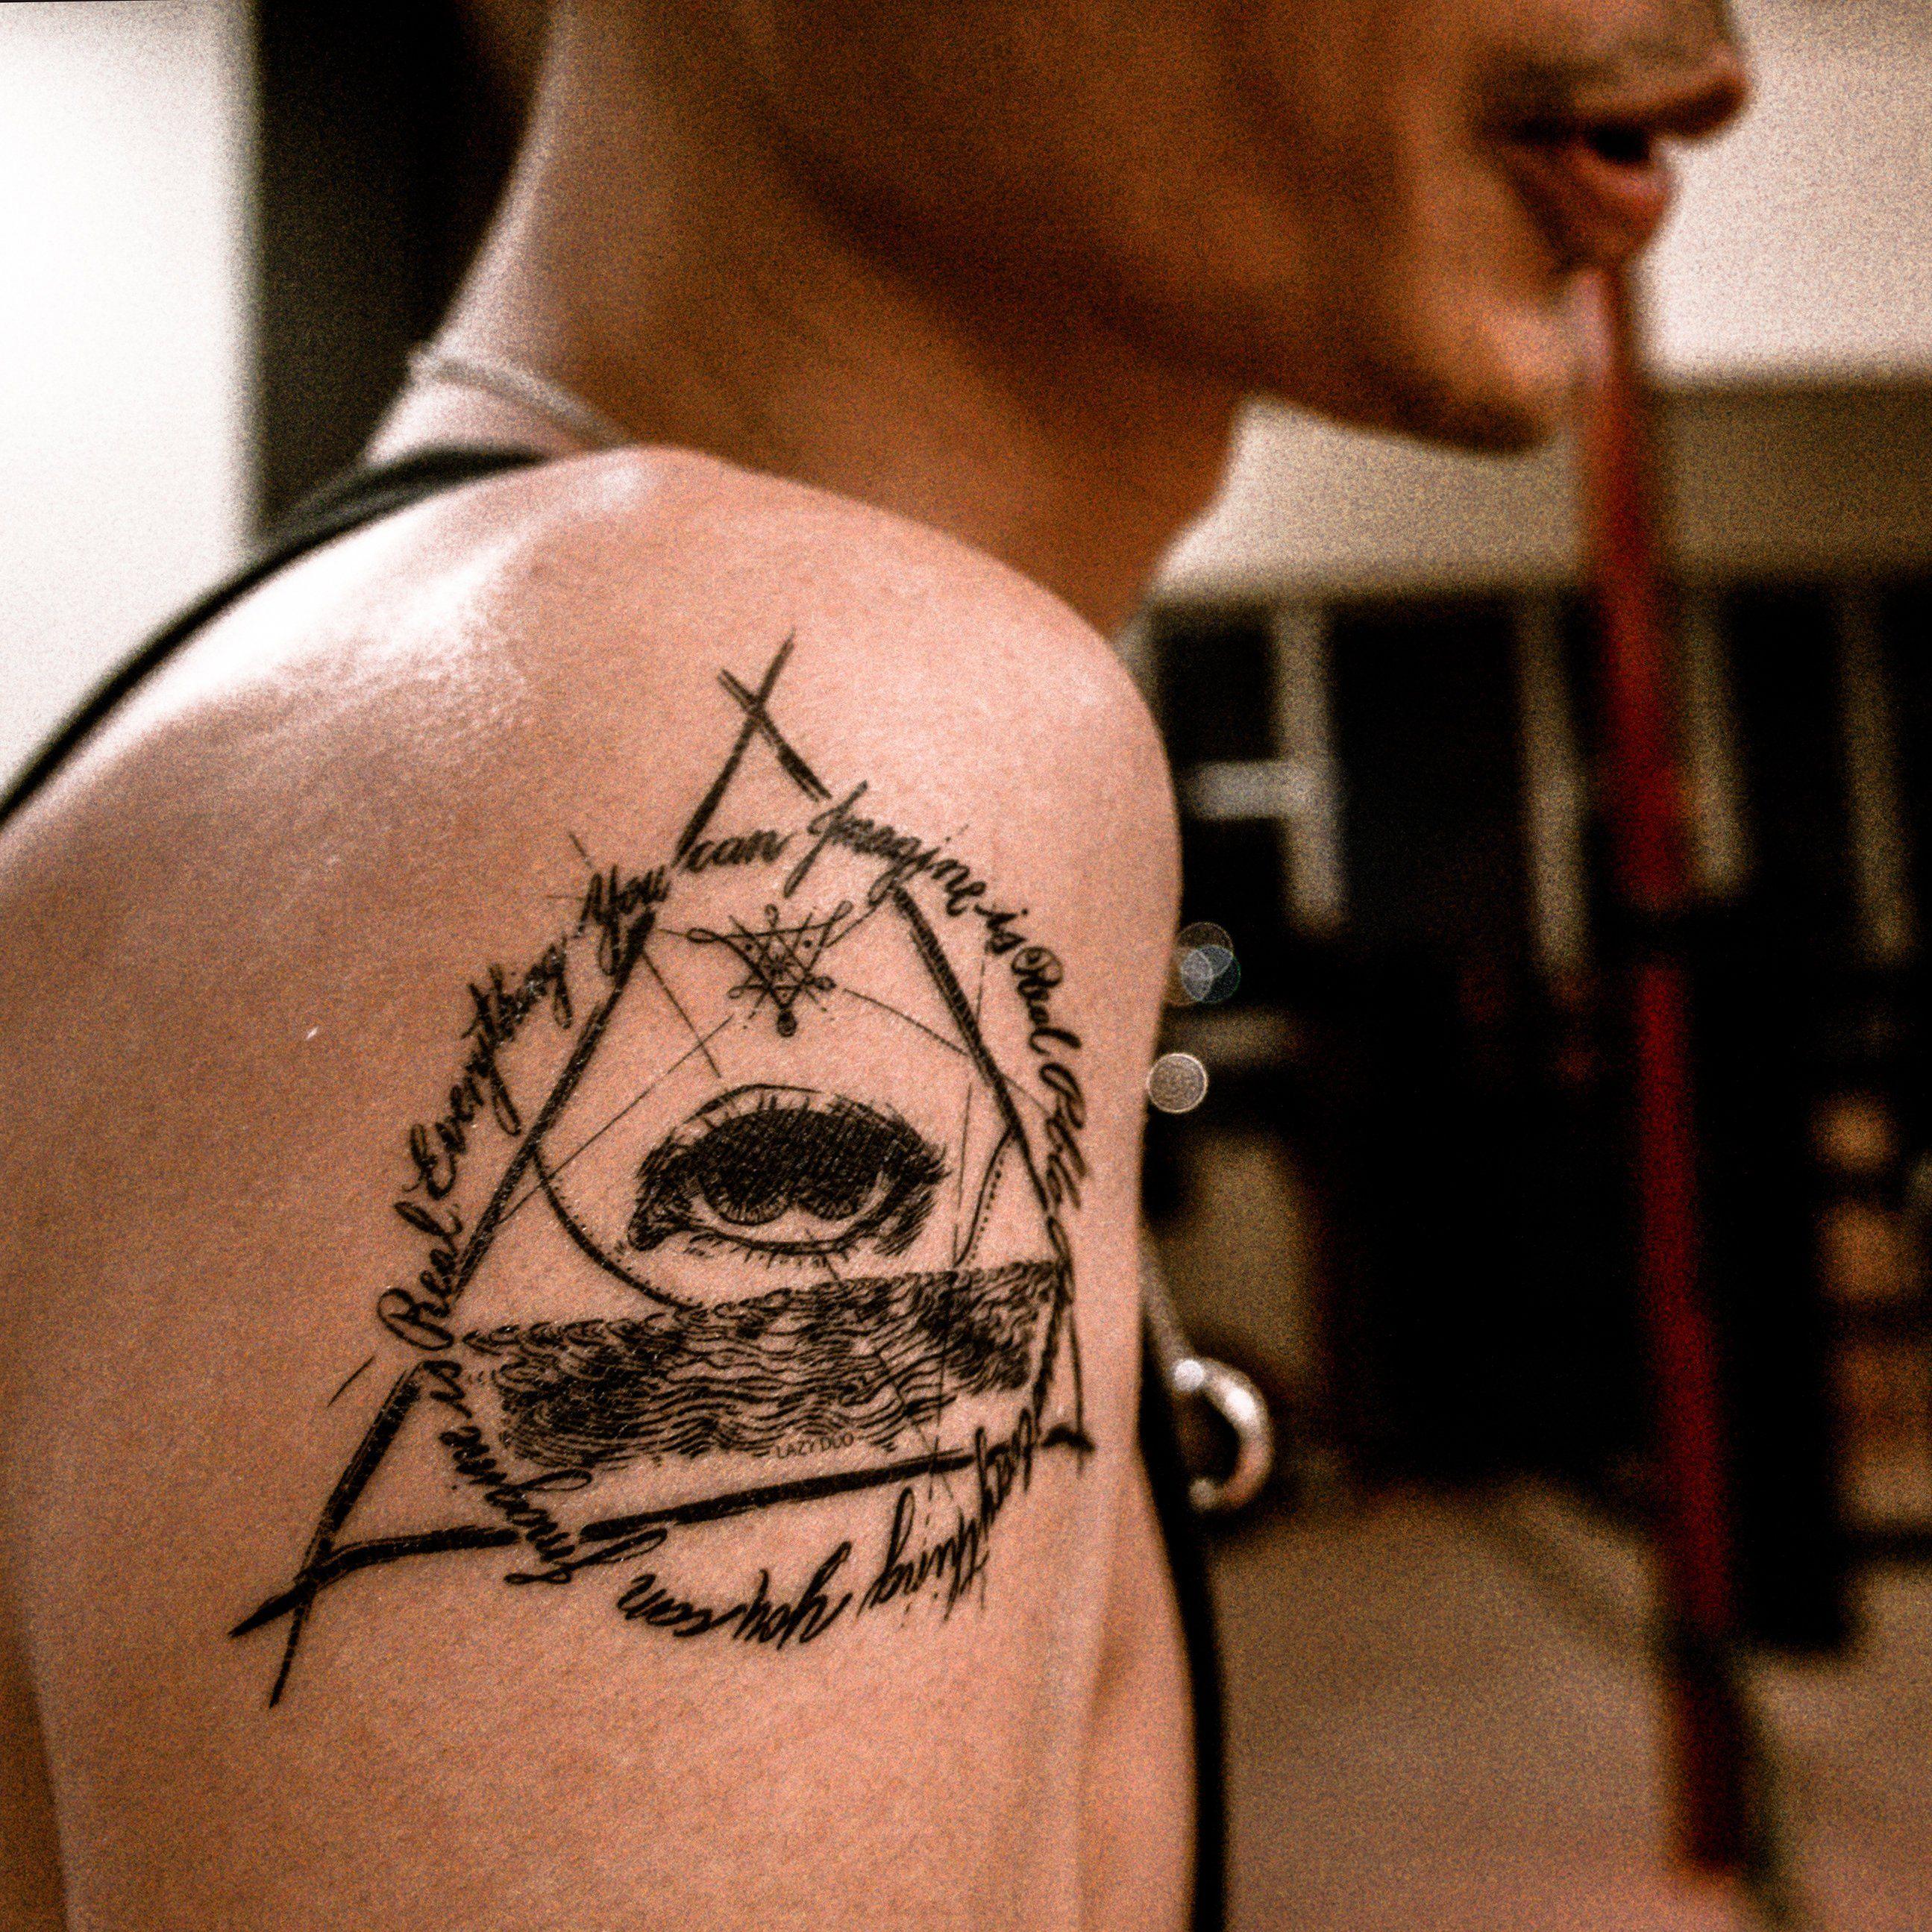 Large Men Tattoos Triangle Tattoos Long Lasting Temporary Etsy Hand Tattoos Triangle Tattoos Small Tattoos For Guys